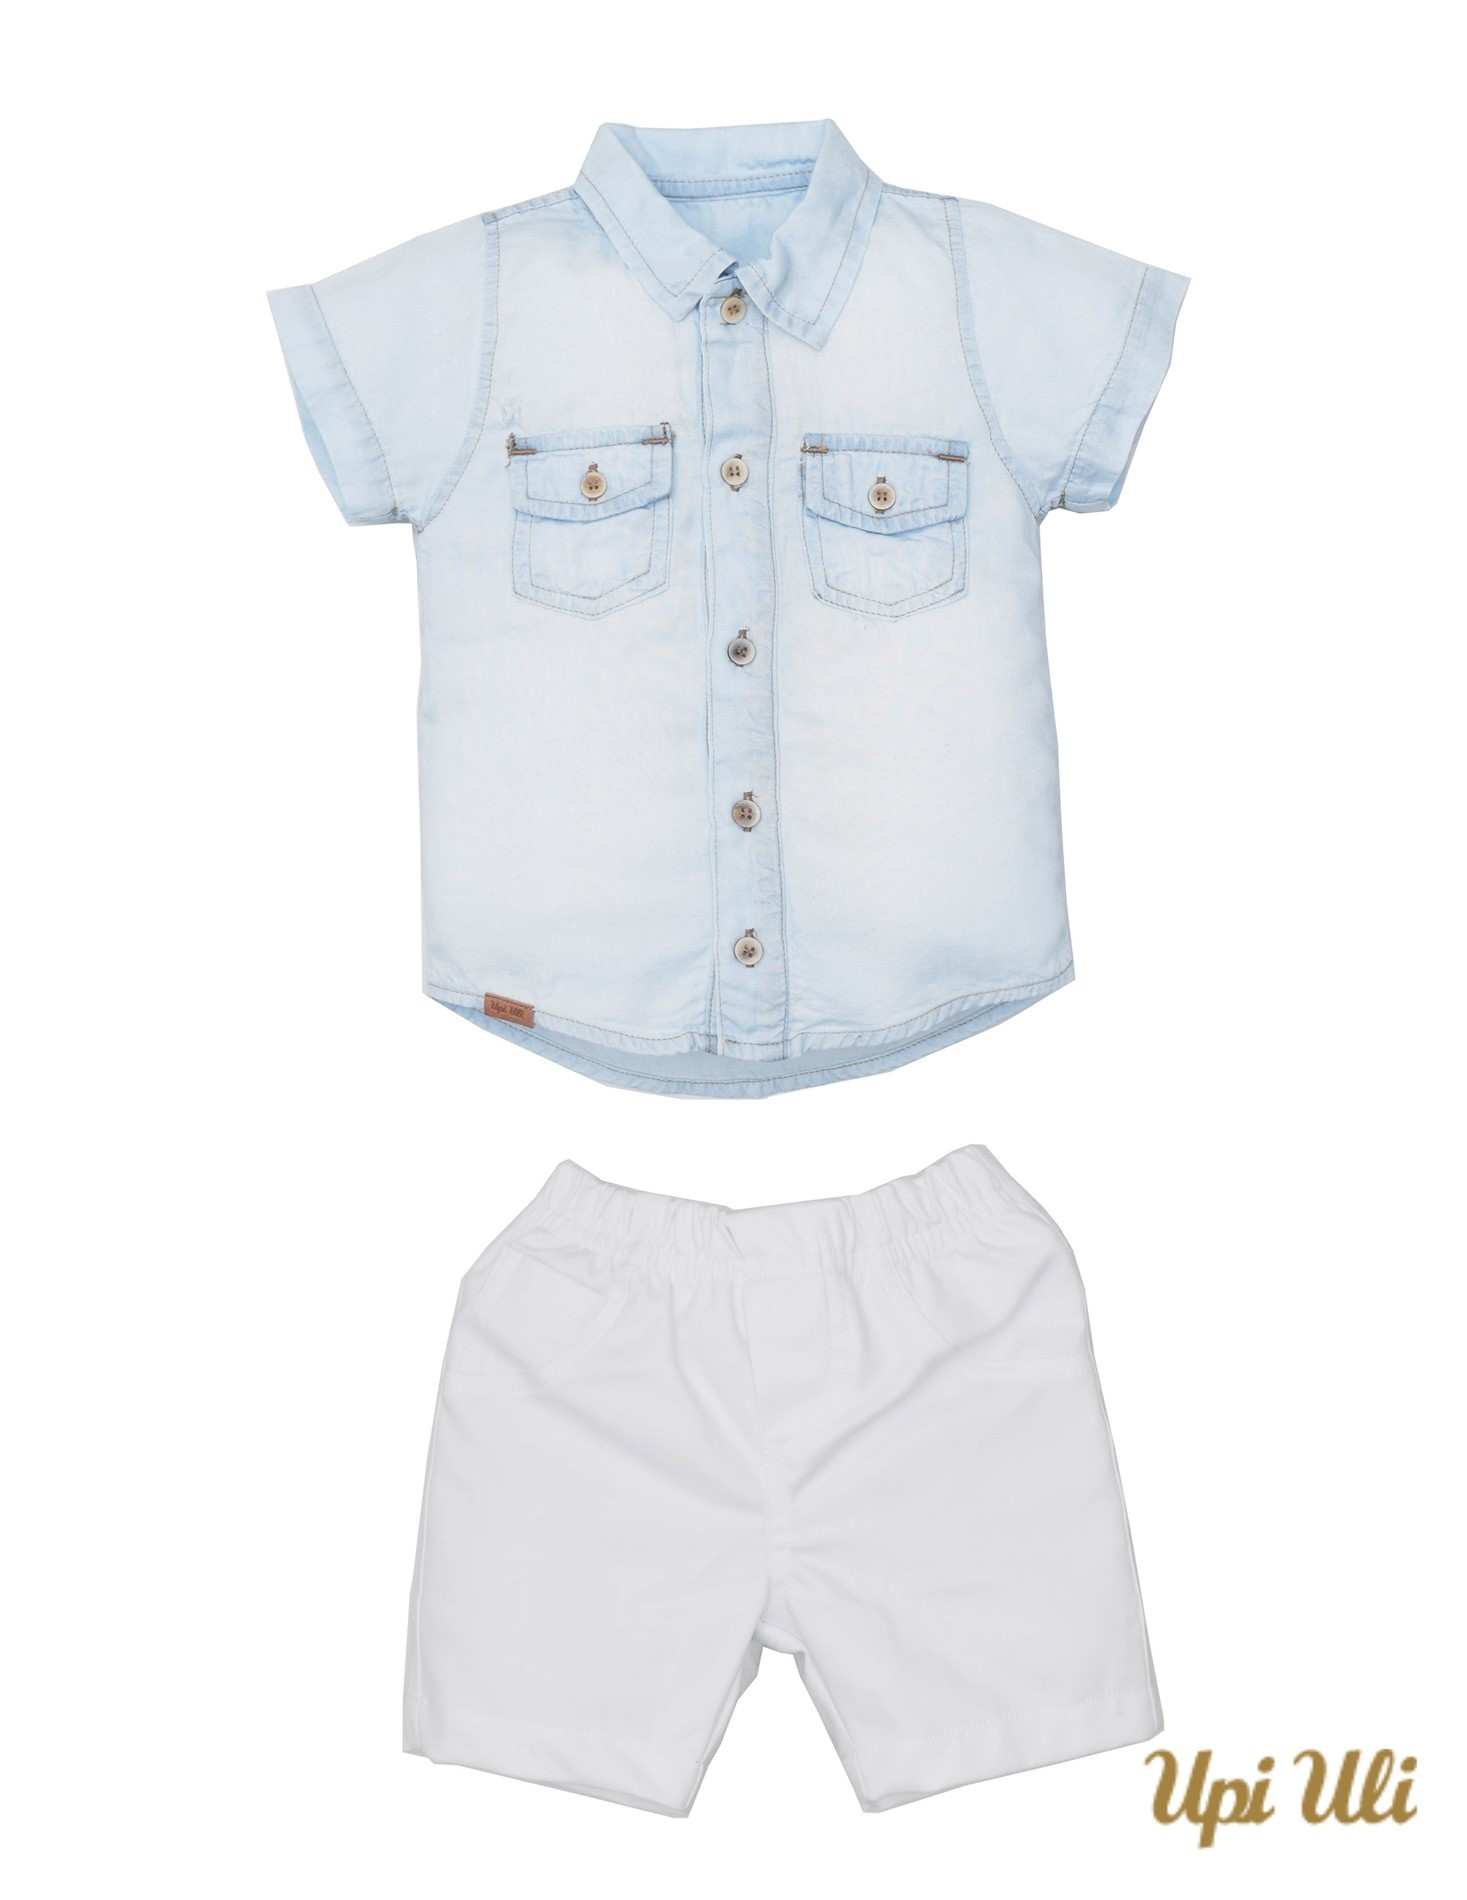 Conj. Camisa Jeans/Compact Cott Eduardo